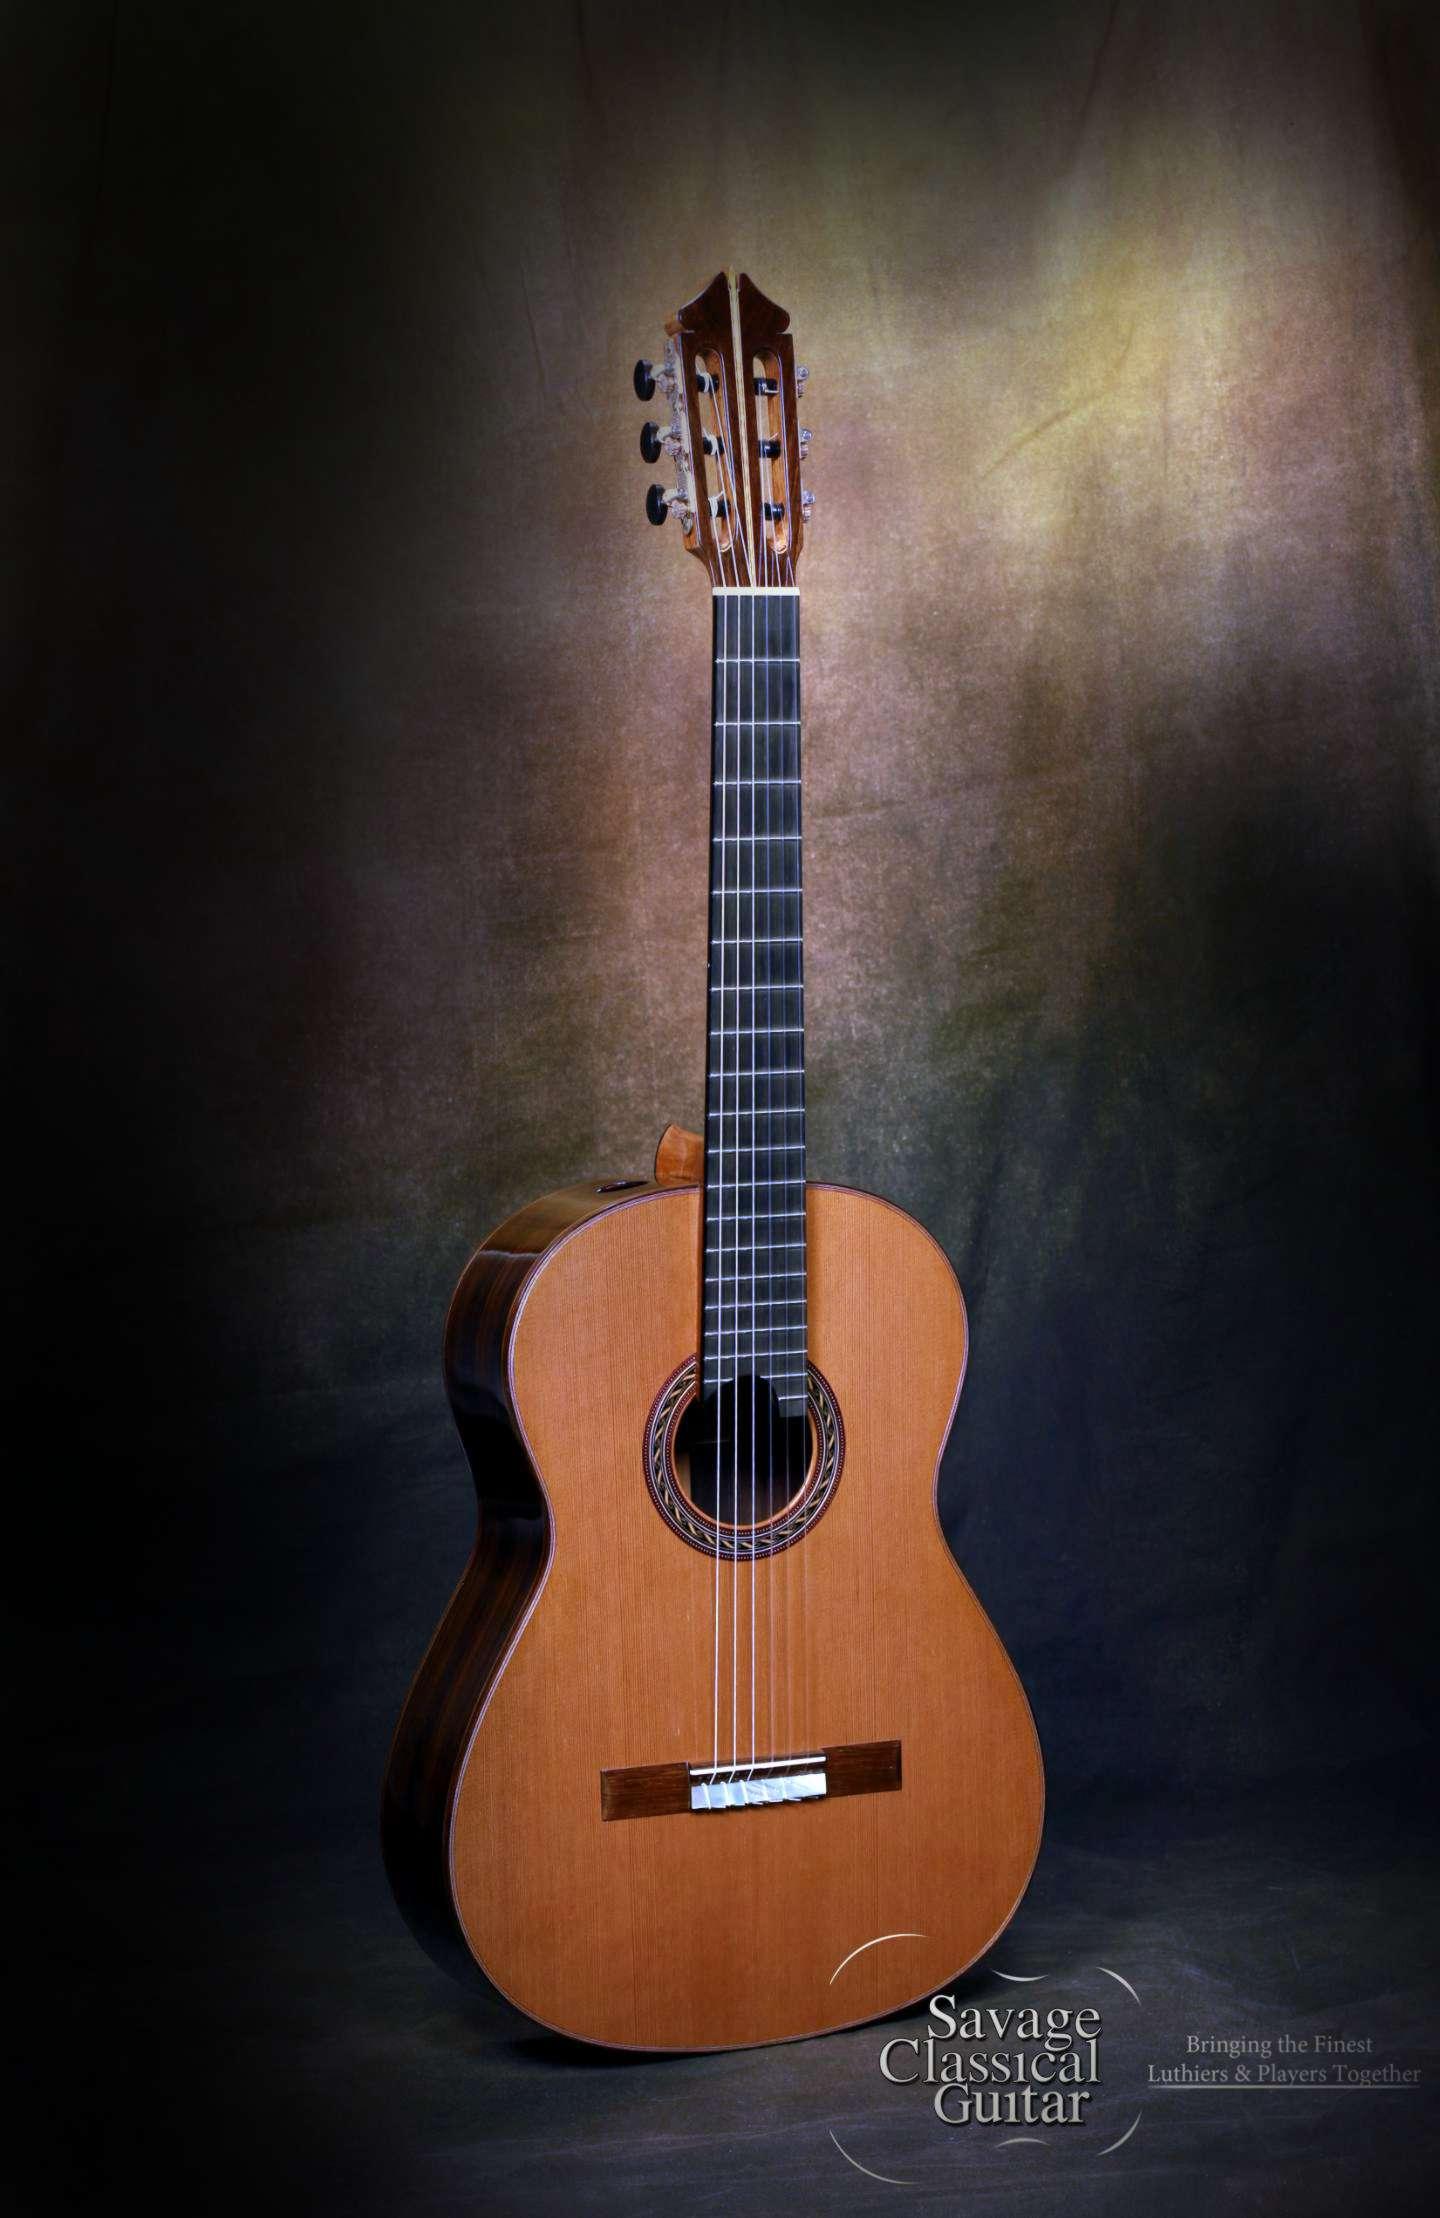 Kenny Hill Signature Classical Guitar 3803 Cedar Savage